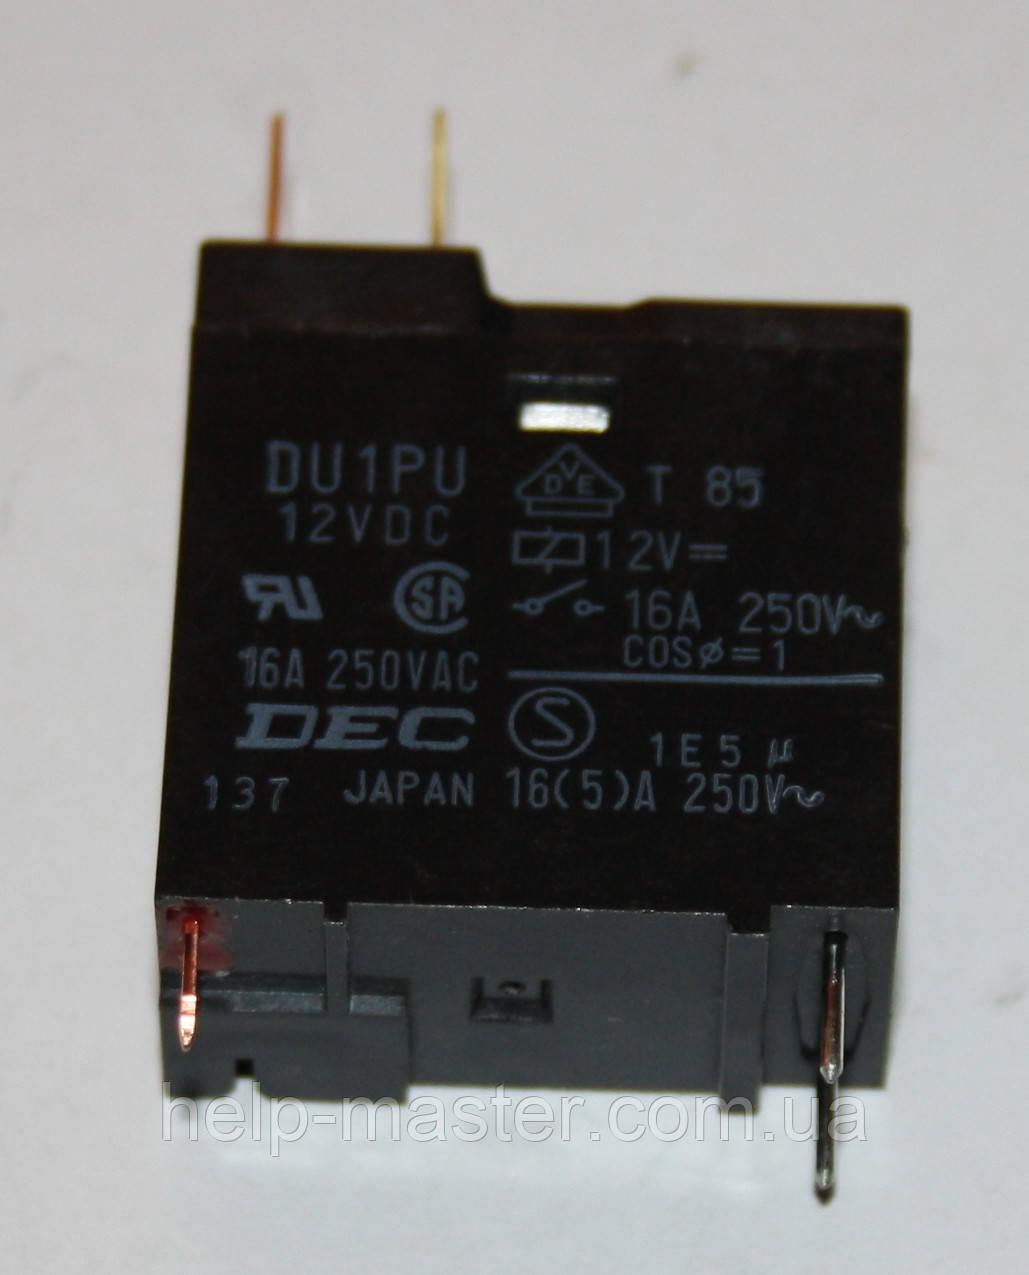 Реле DU1PU (12VDC)